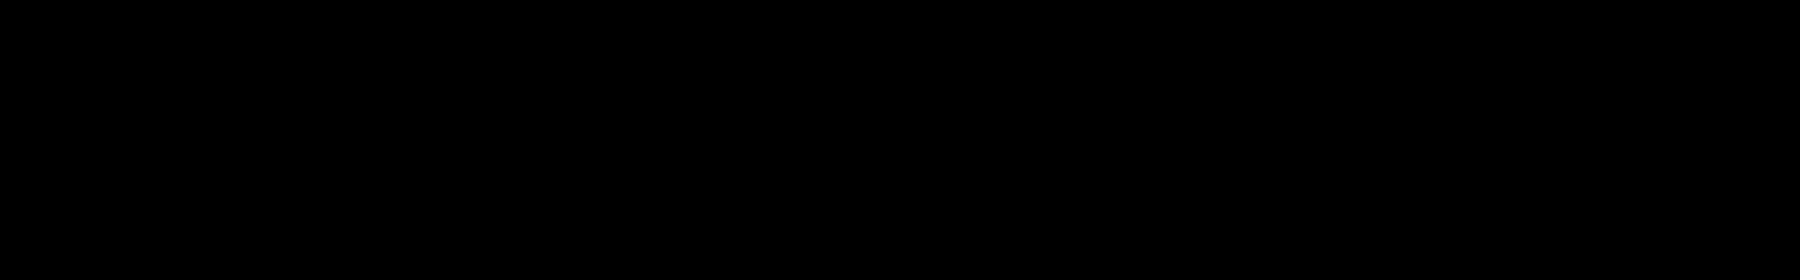 Genesis Trap audio waveform